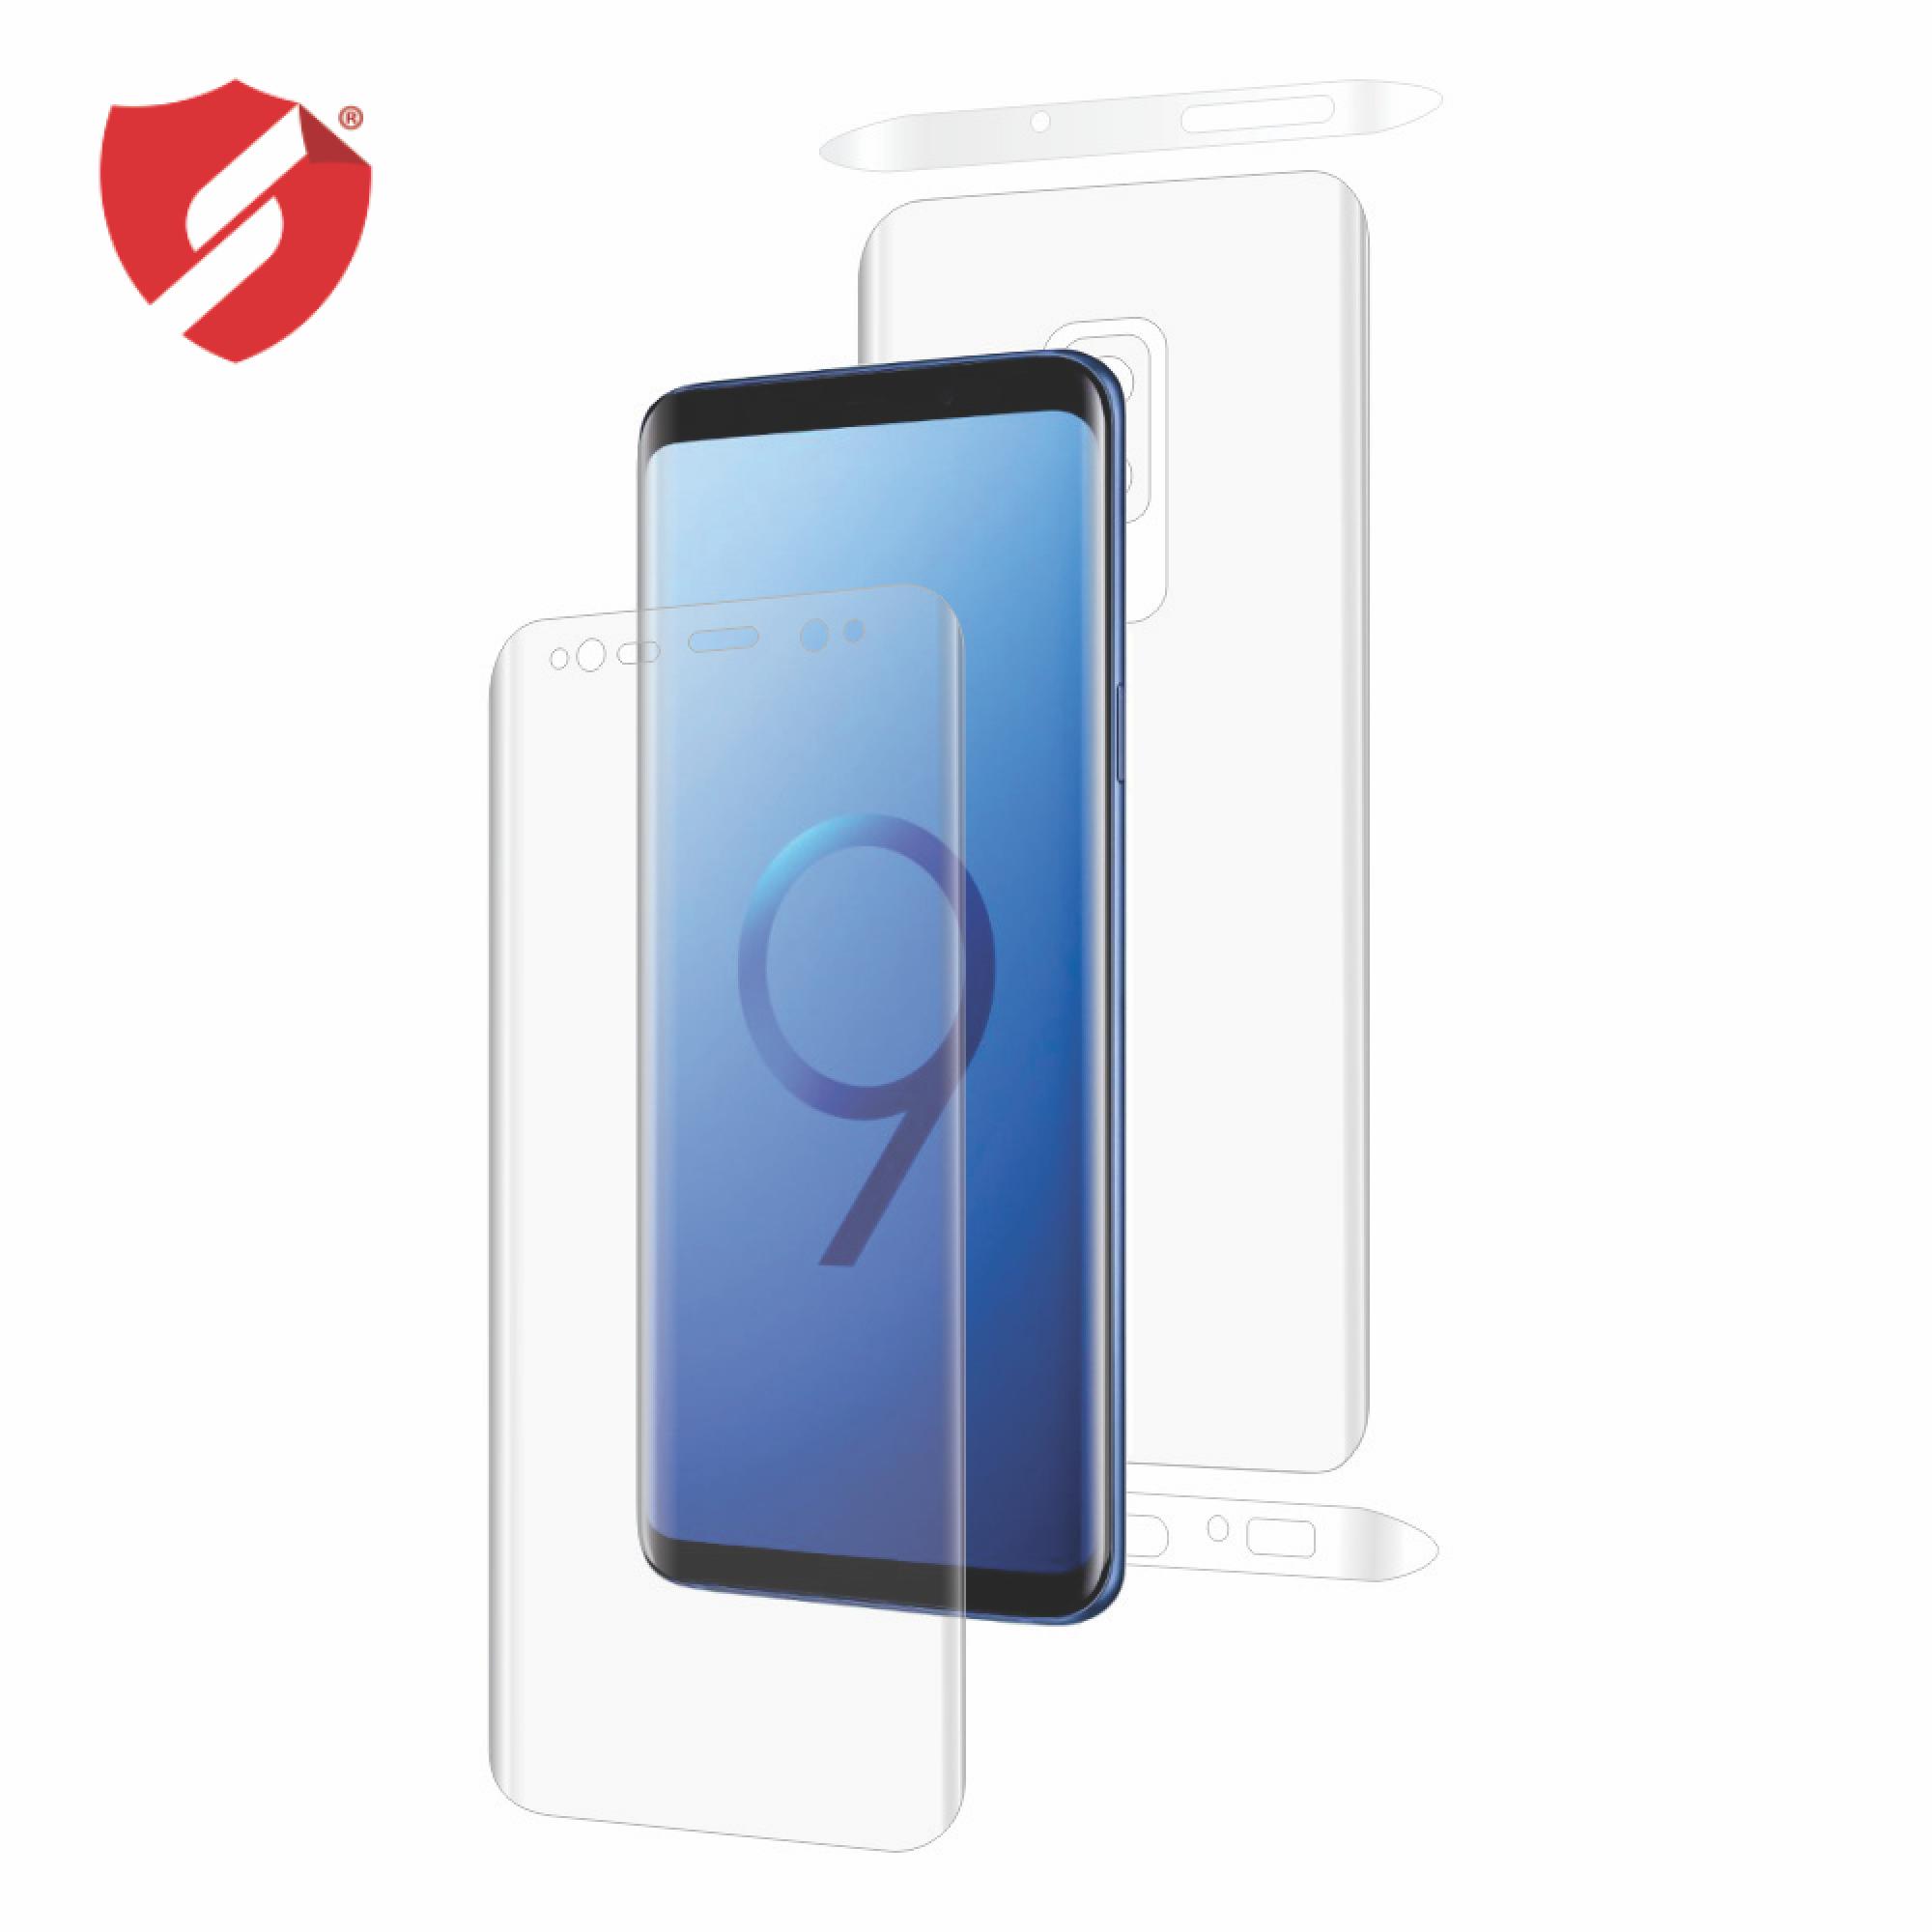 Folie de protectie Smart Protection Samsung Galaxy S9 Plus compatibila cu carcasa Spigen Rugged Armor - fullbody - display + spate + laterale imagine